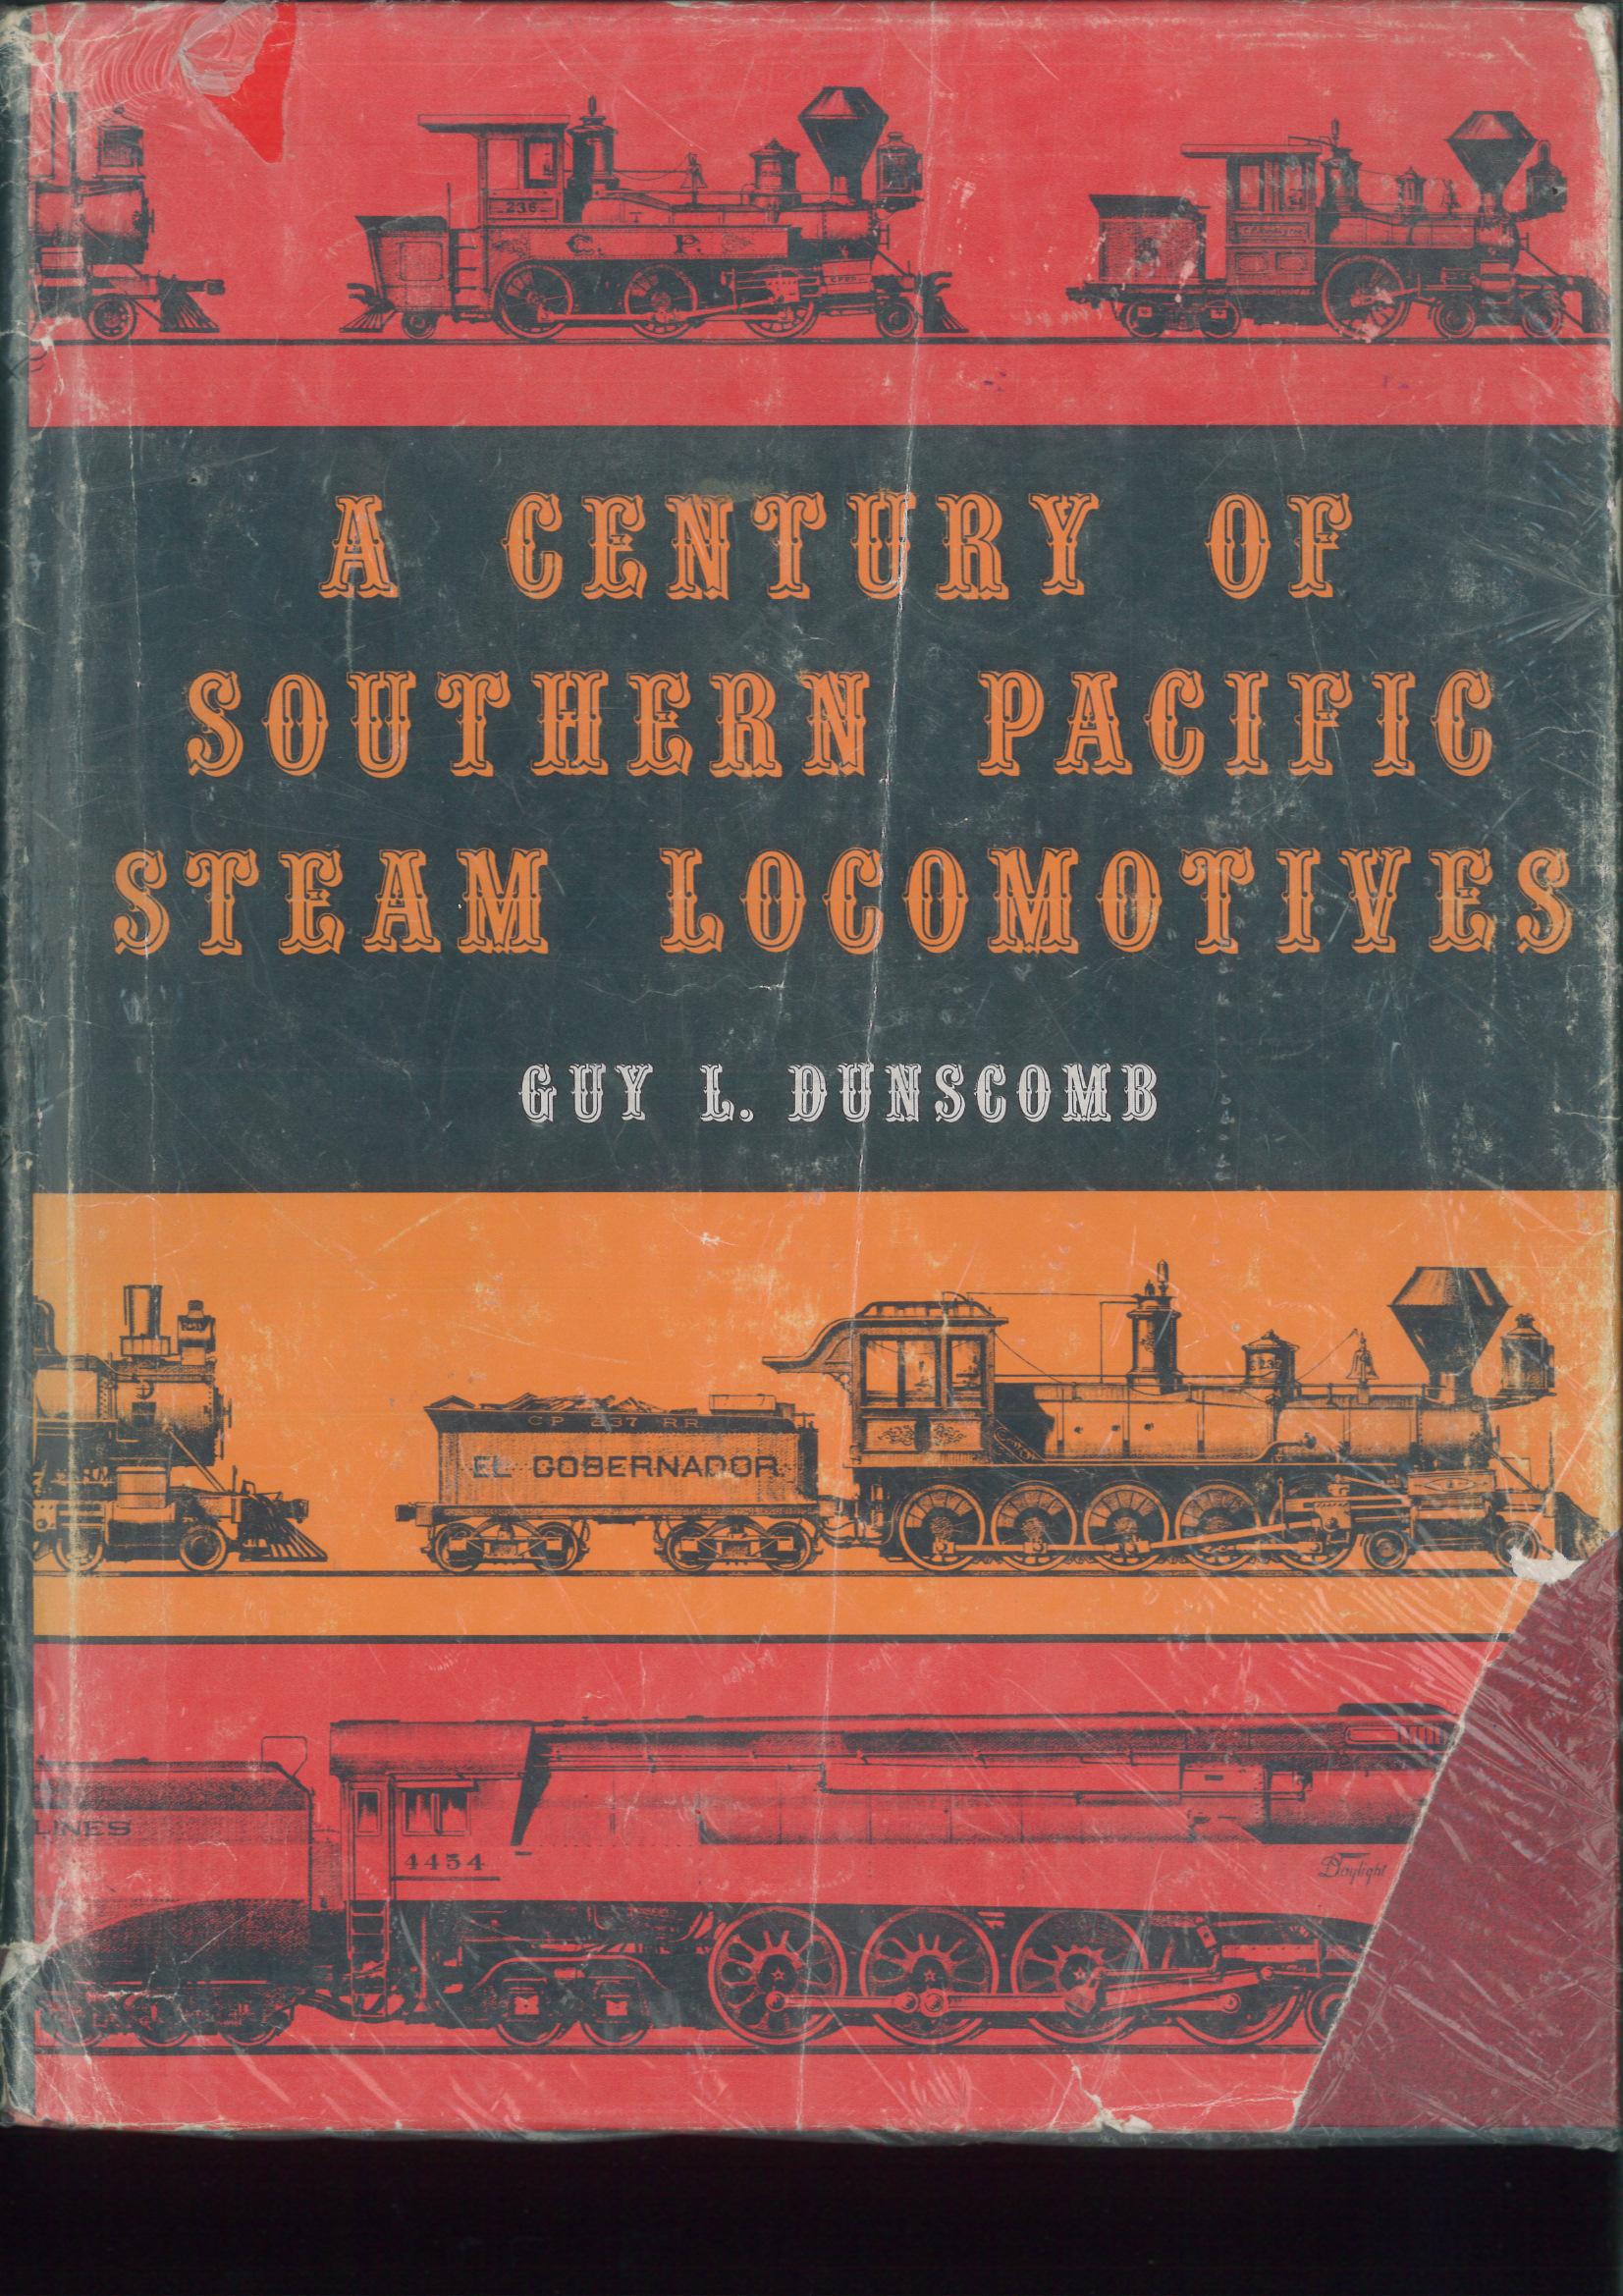 A Century of Southern Pacific Steam Locomotives - 1862-1962  - SELTEN - Guy L.Dunscomb | günstig bestellen bei Modelleisenbahn Center  MCS Vertriebs GmbH